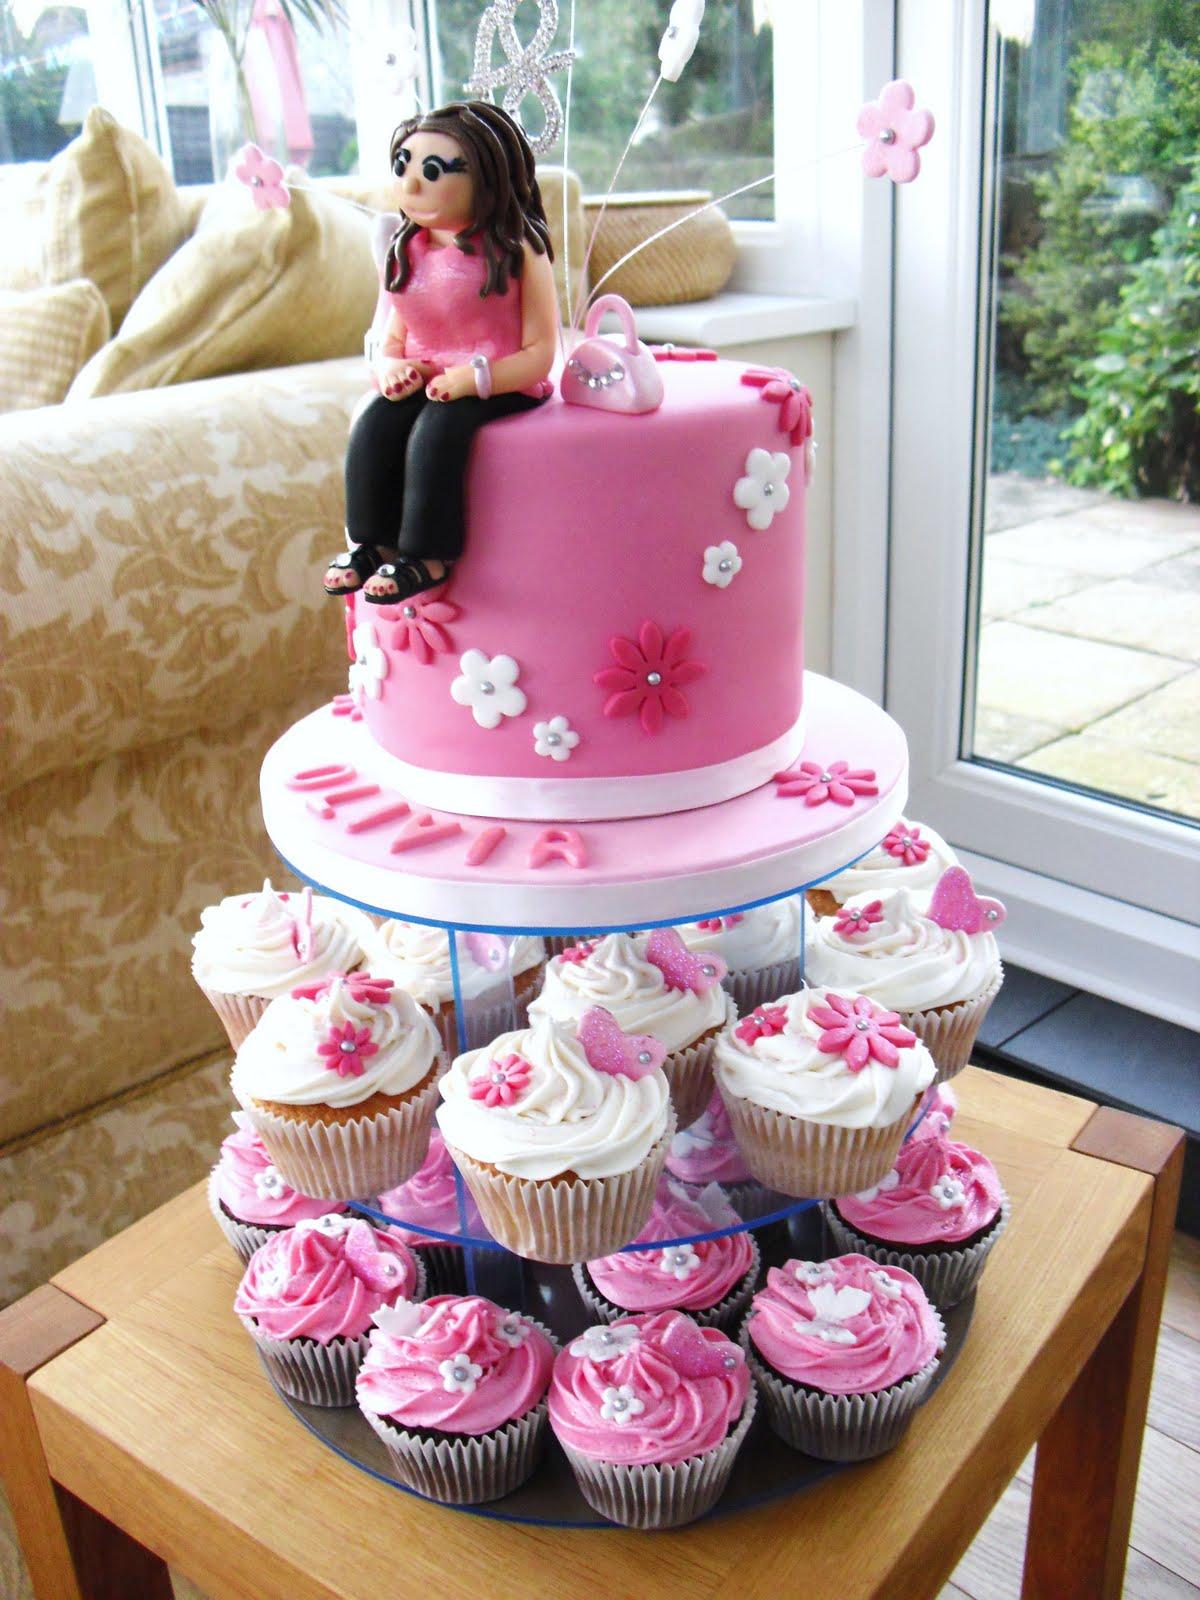 Cake Walk: Olivia's 18th Birthday Cake